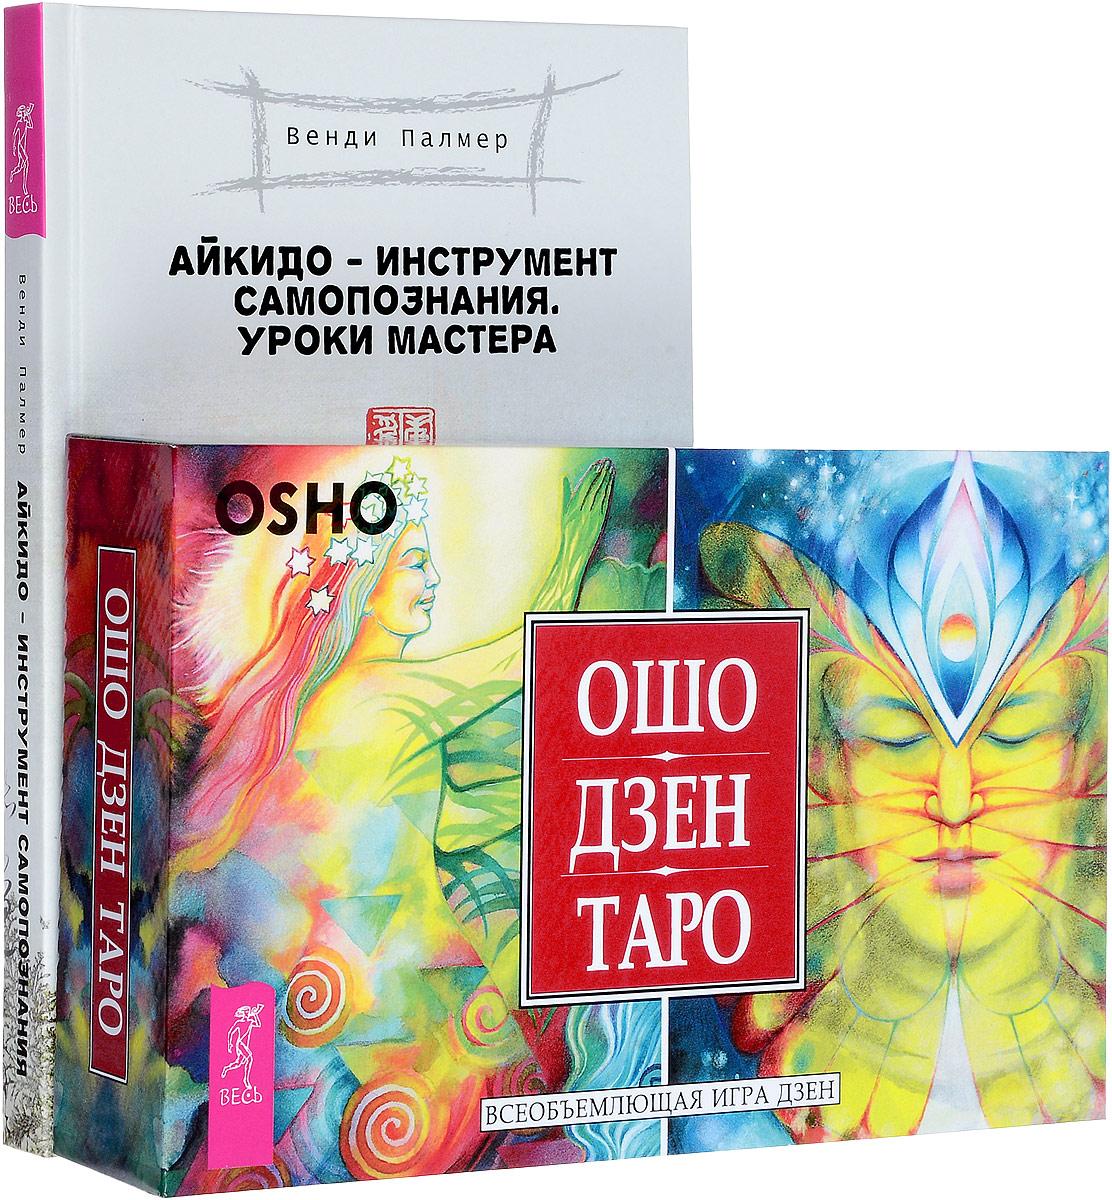 Айкидо - инструмент самопознания. Ошо Дзен Таро (комплект из 2 книг + 79 карт). Венди Палмер, Ошо